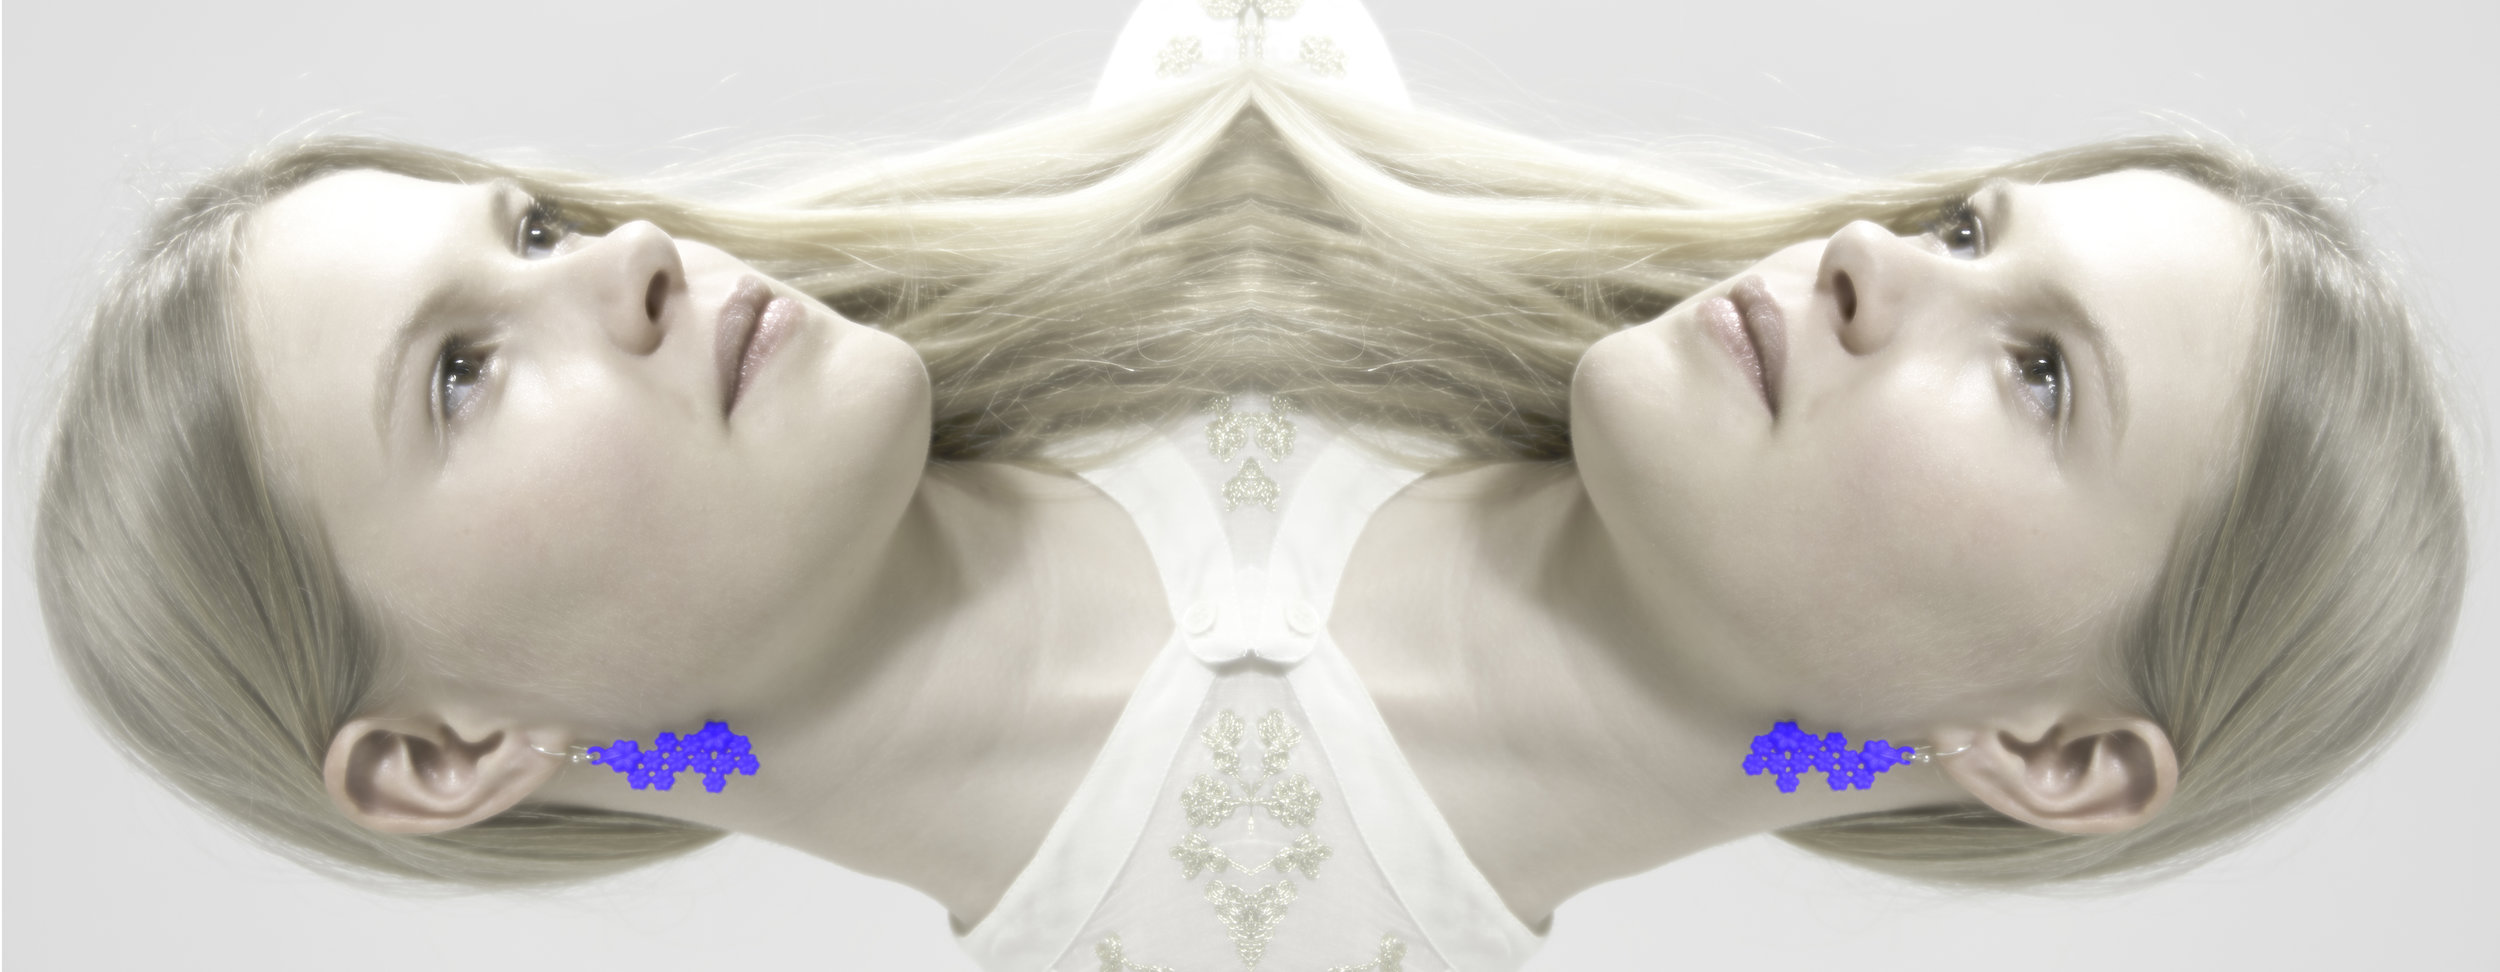 Hortensia-OB-Blauw-spiegel.jpg